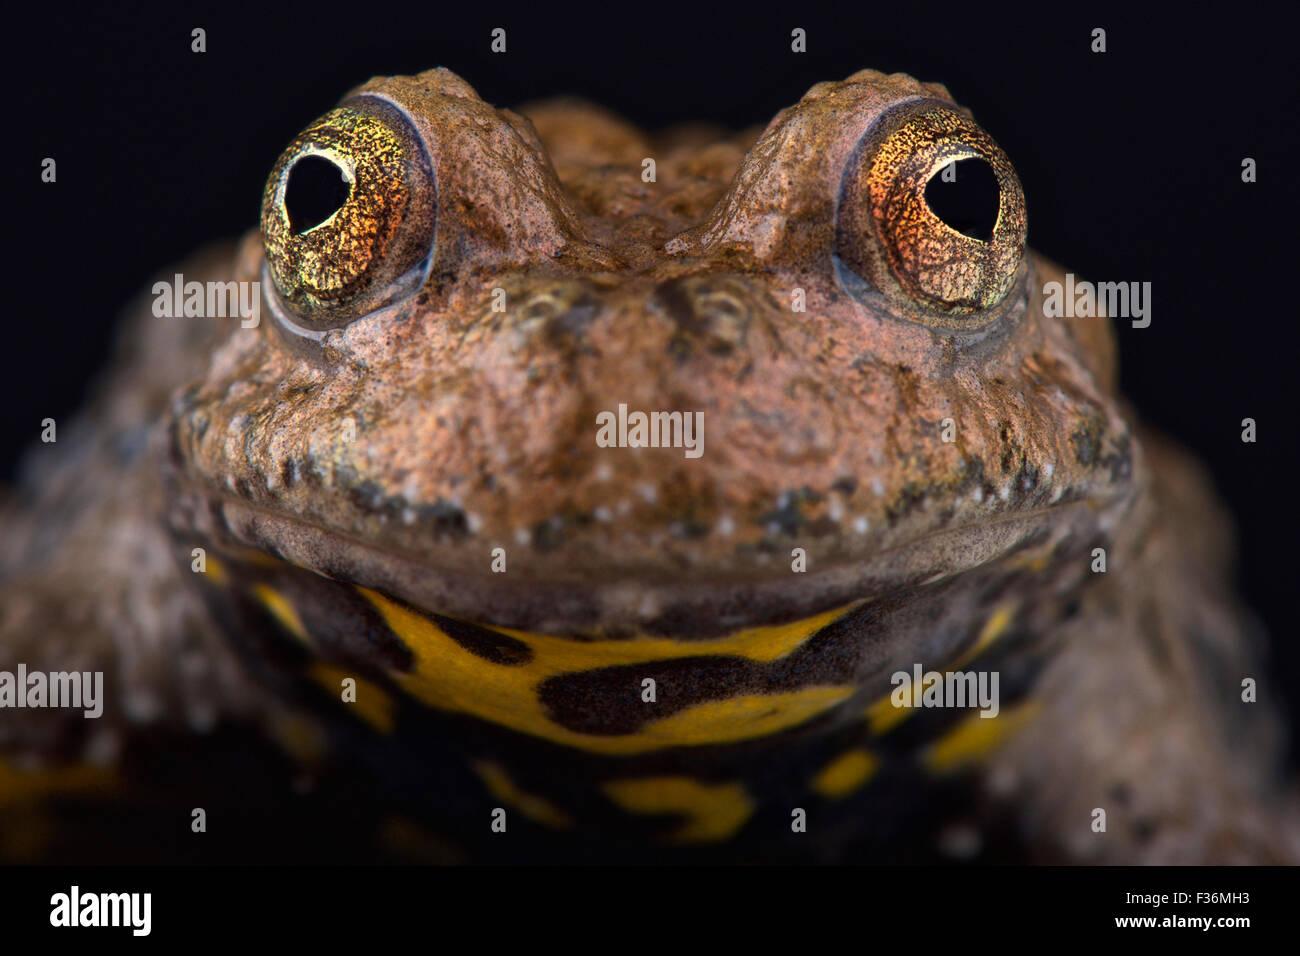 Yunnan fire-bellied toad (Bombina maxima) - Stock Image